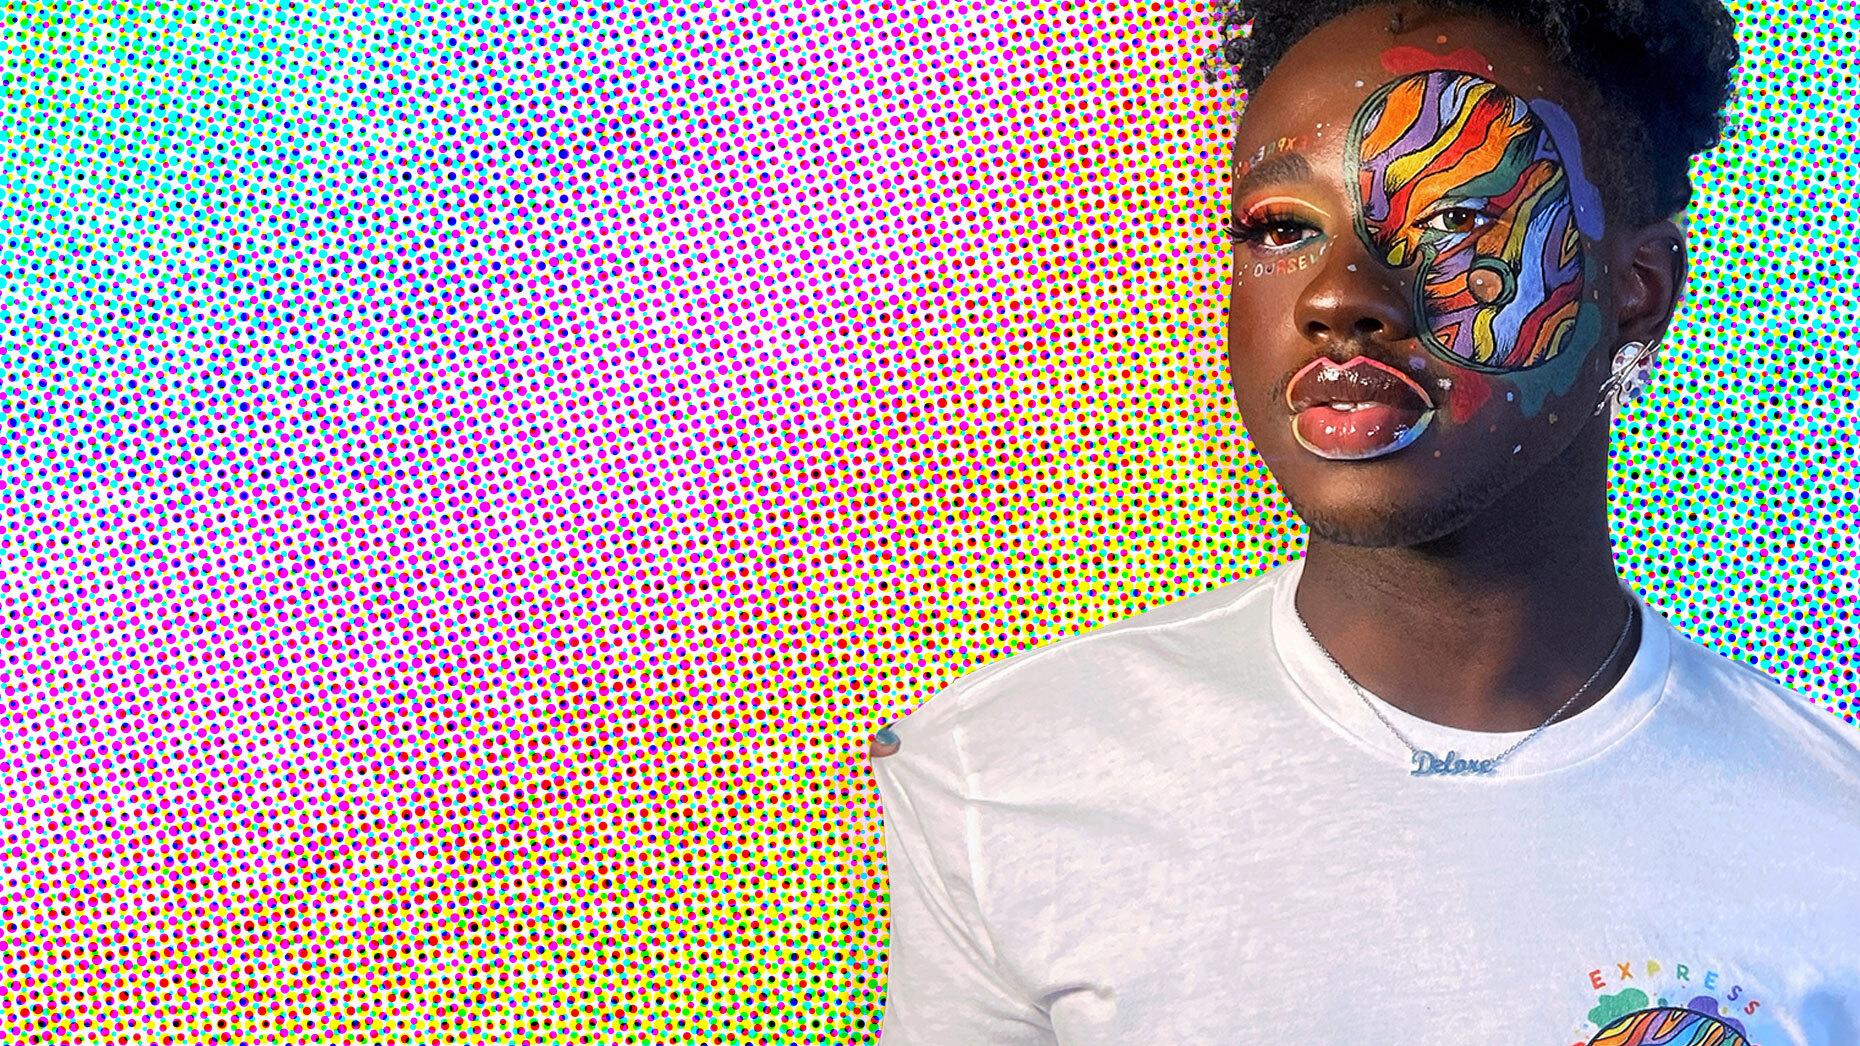 Makeup artist and influencer Jeremiah Jacques. Photo: Jeremiah Jacques